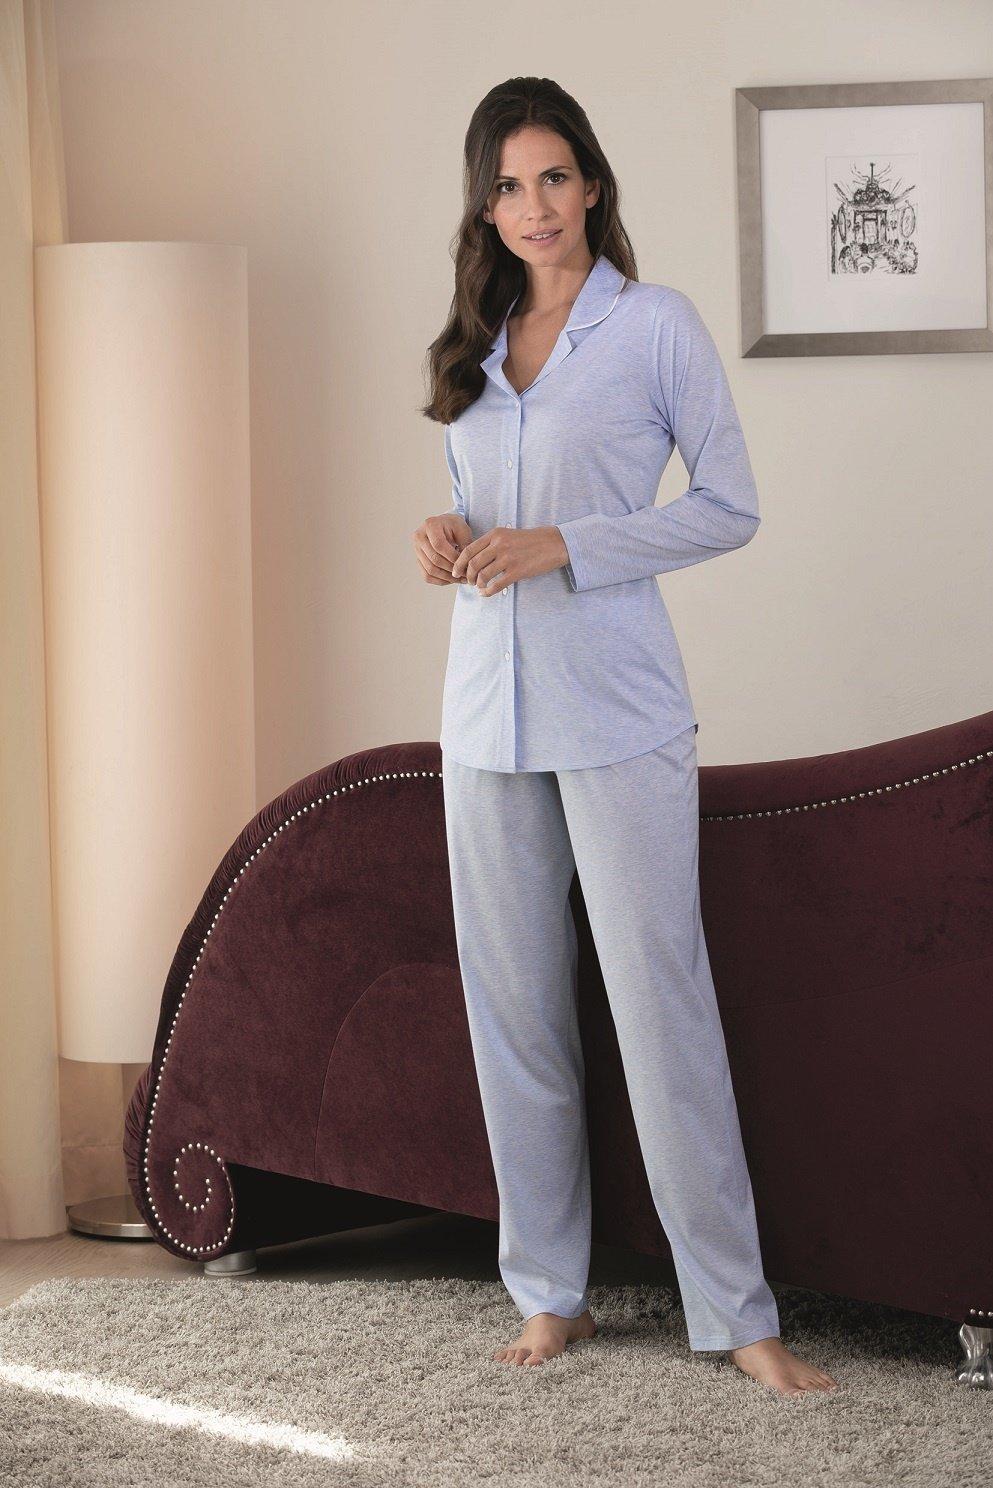 finest selection 37c84 bb359 Novila|Damen Pyjama|Schlafanzug Jersey|Textile Träume|Neue Kollektion